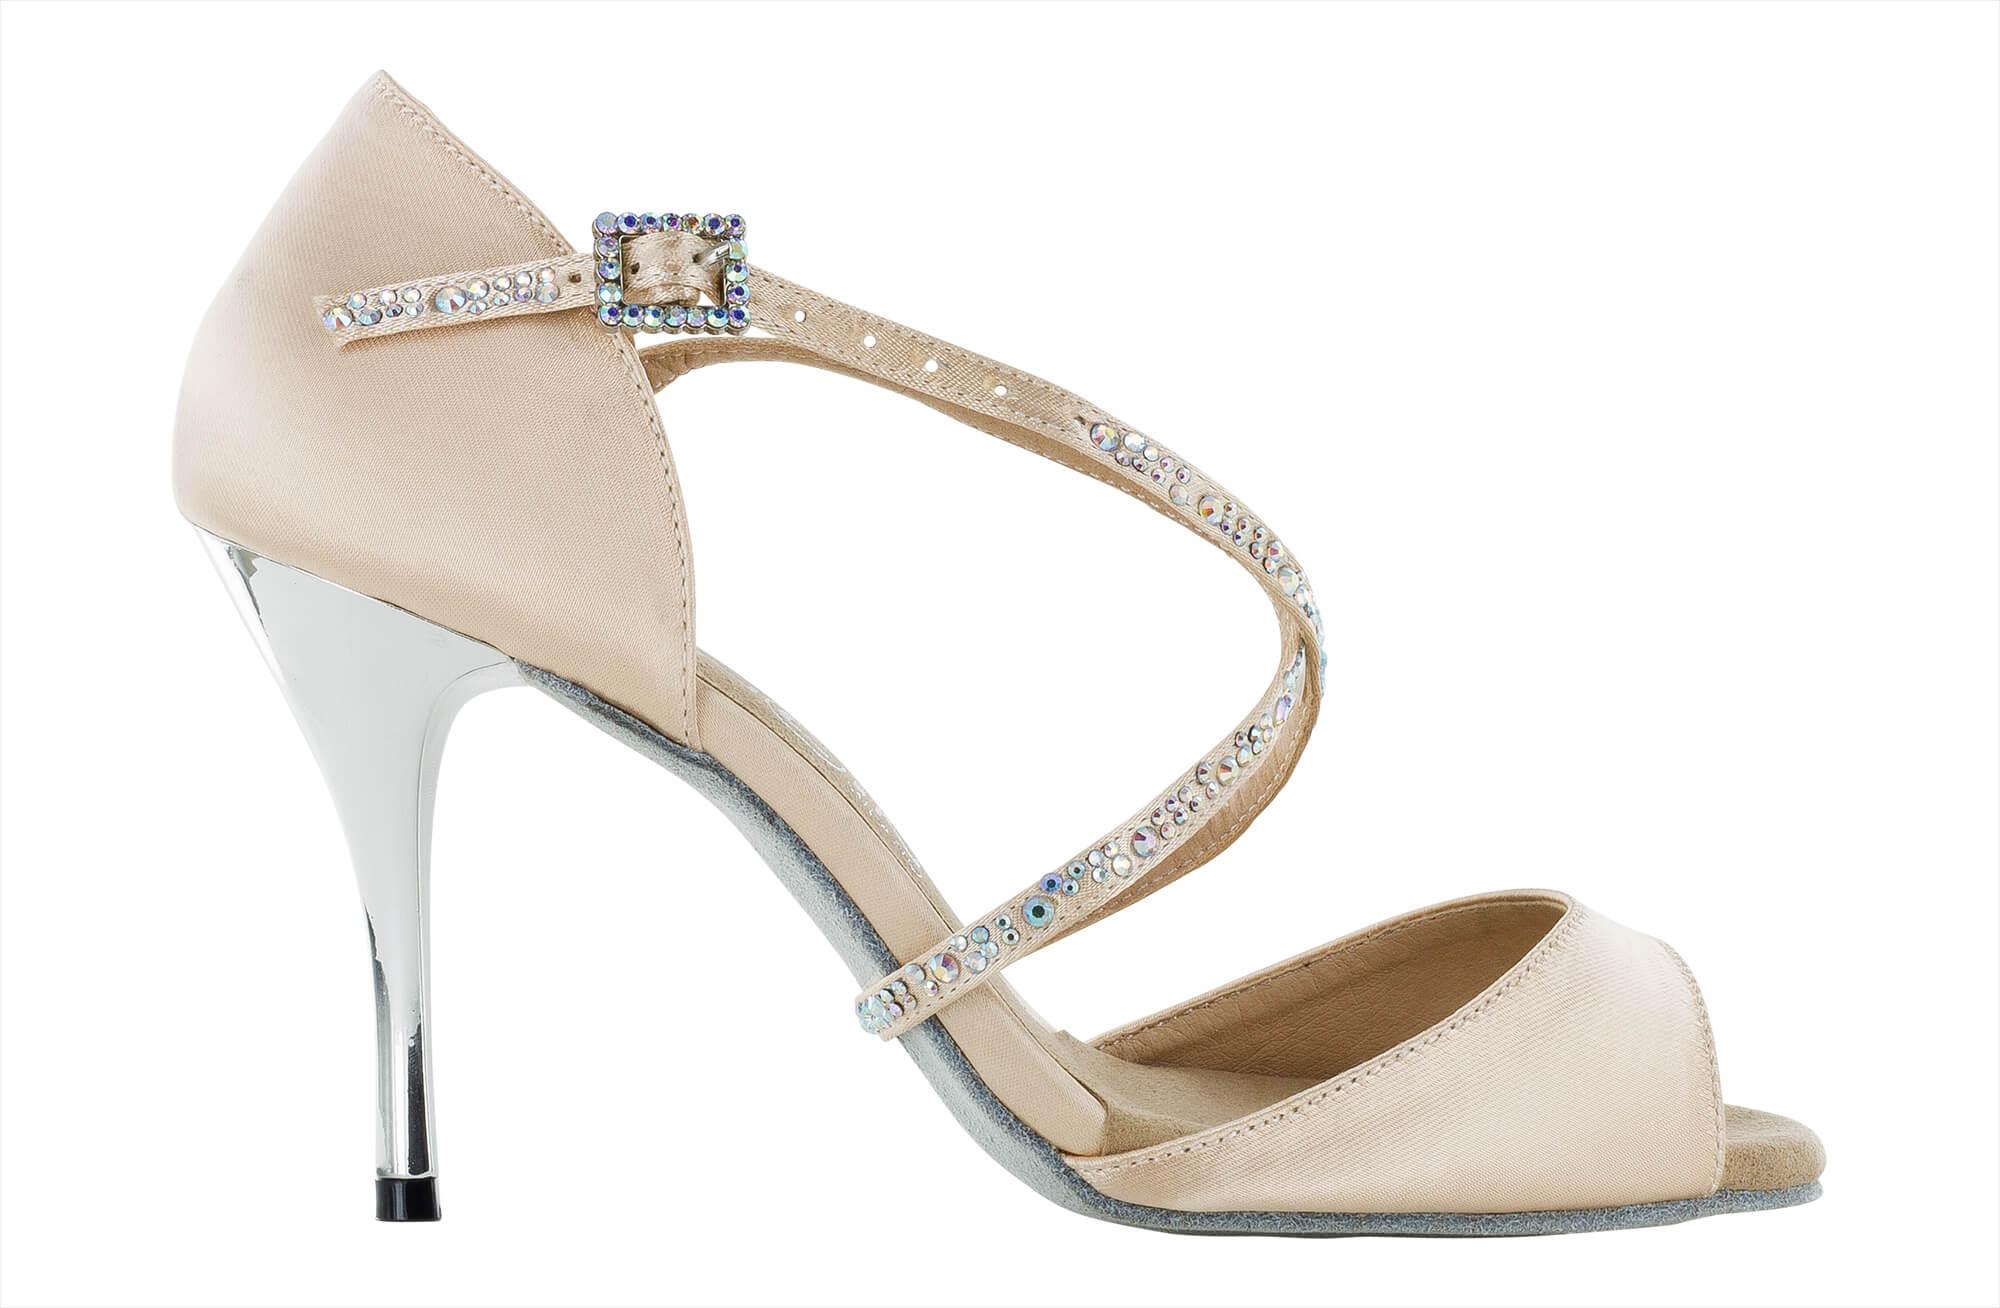 Zapatos de baile Danc'in en Raso Rosa conTacón de 9cm